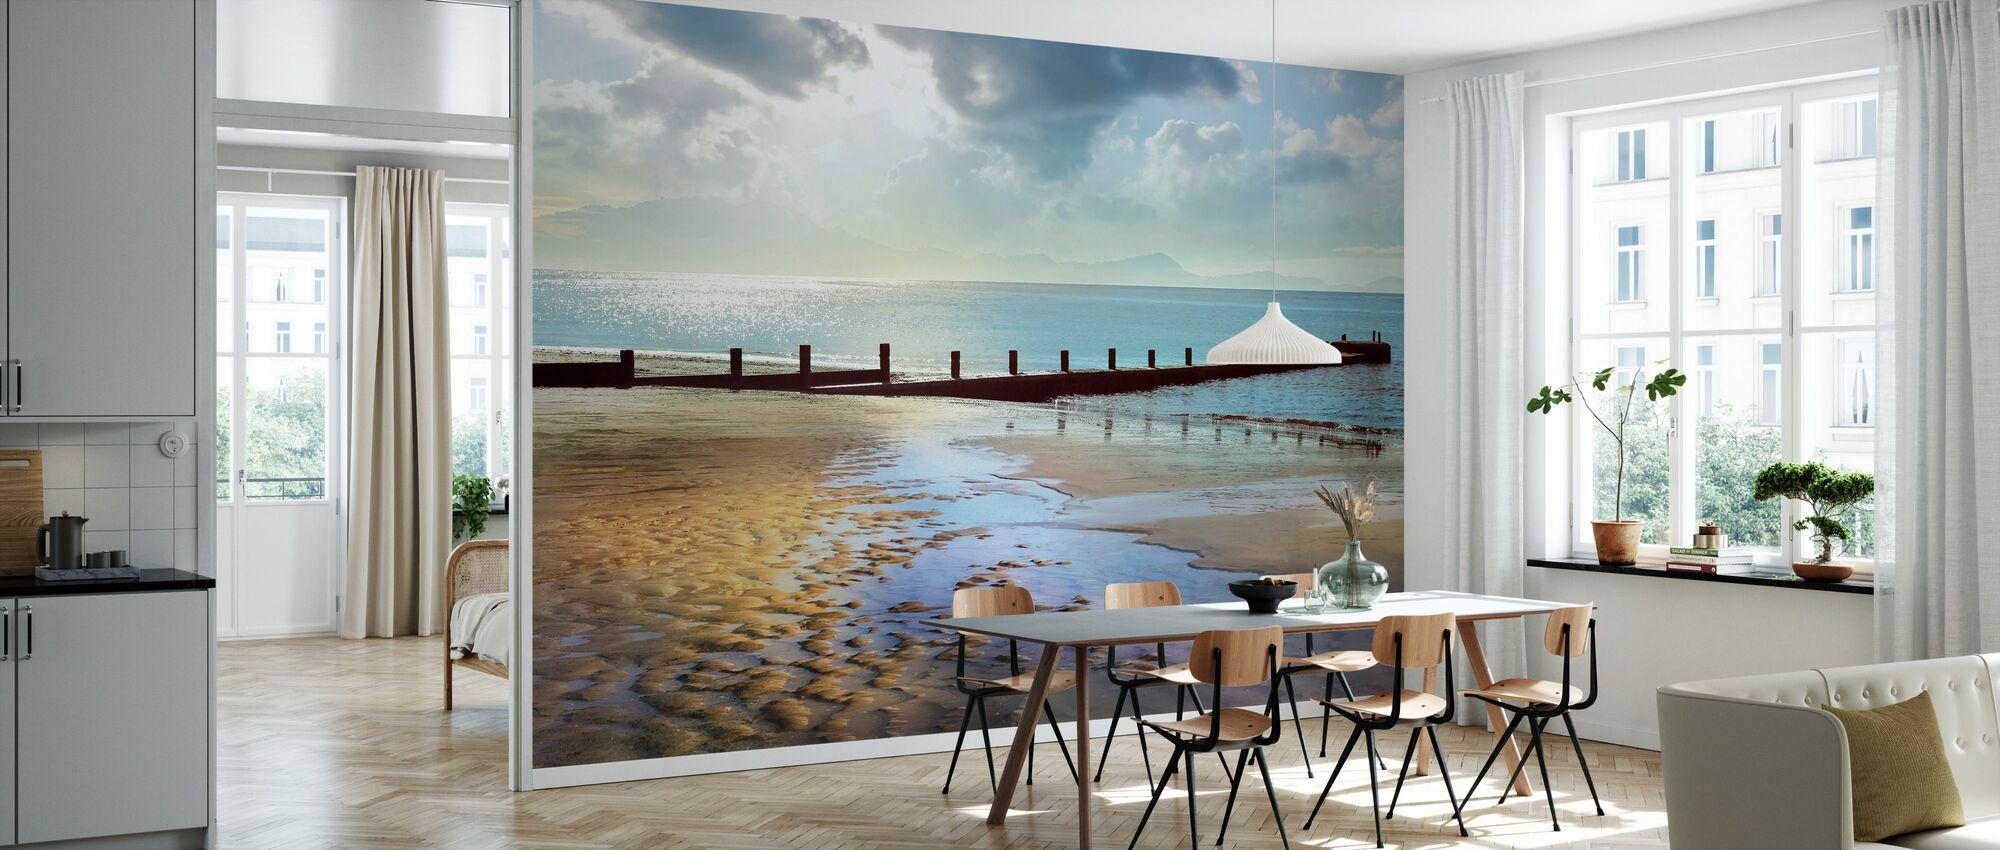 Beachline Sunny View - Wallpaper - Kitchen